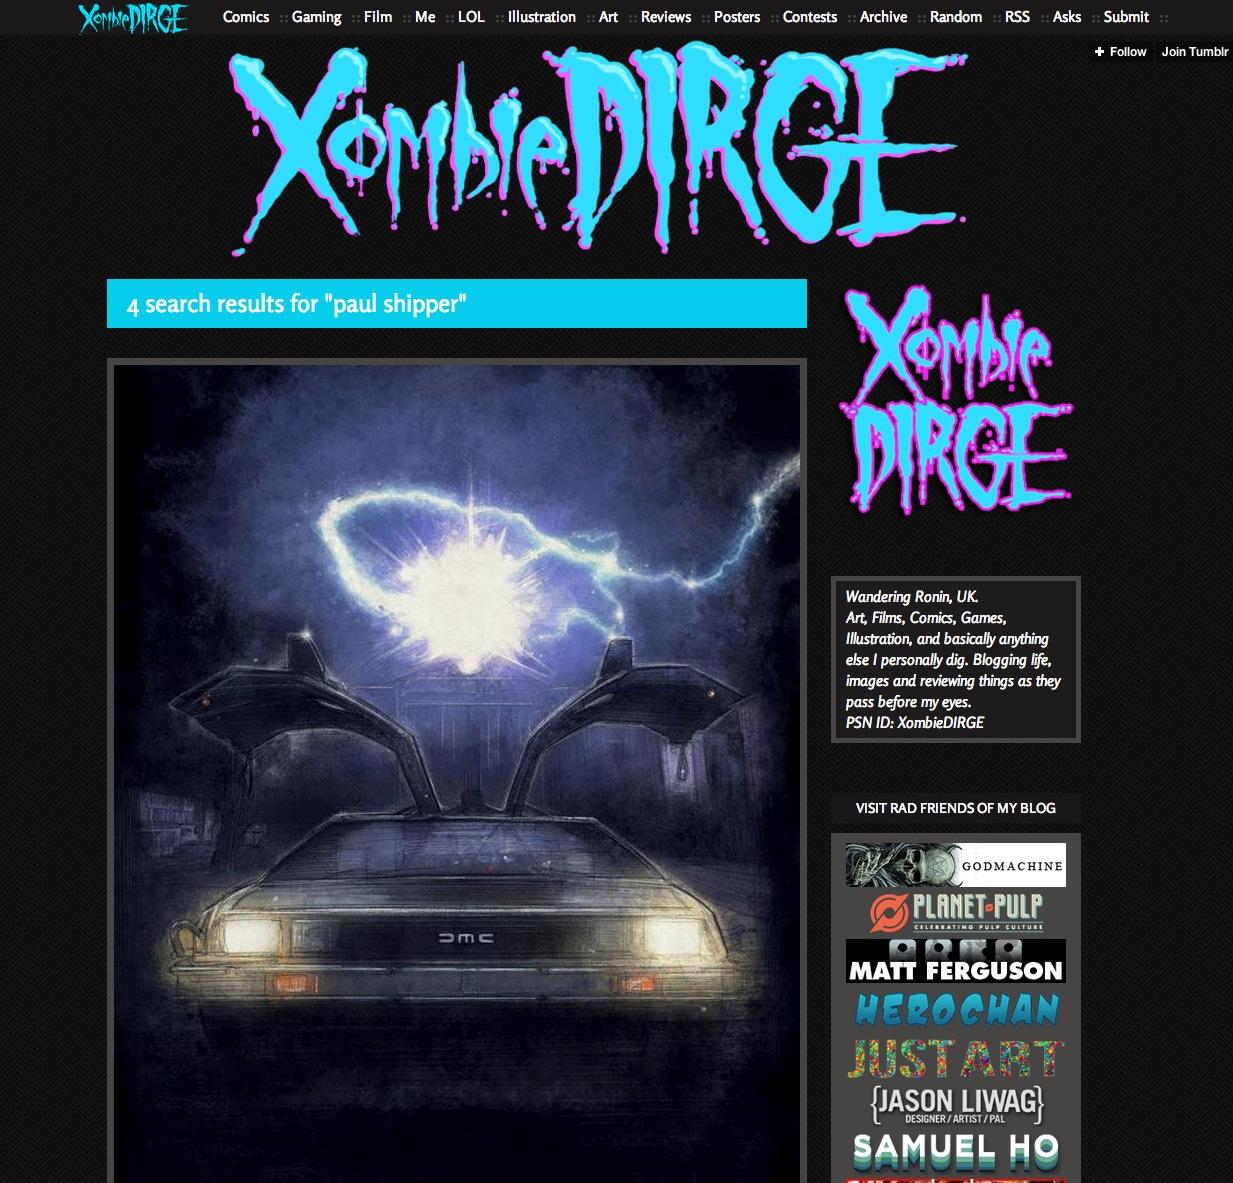 Feautured on Xombiedirge